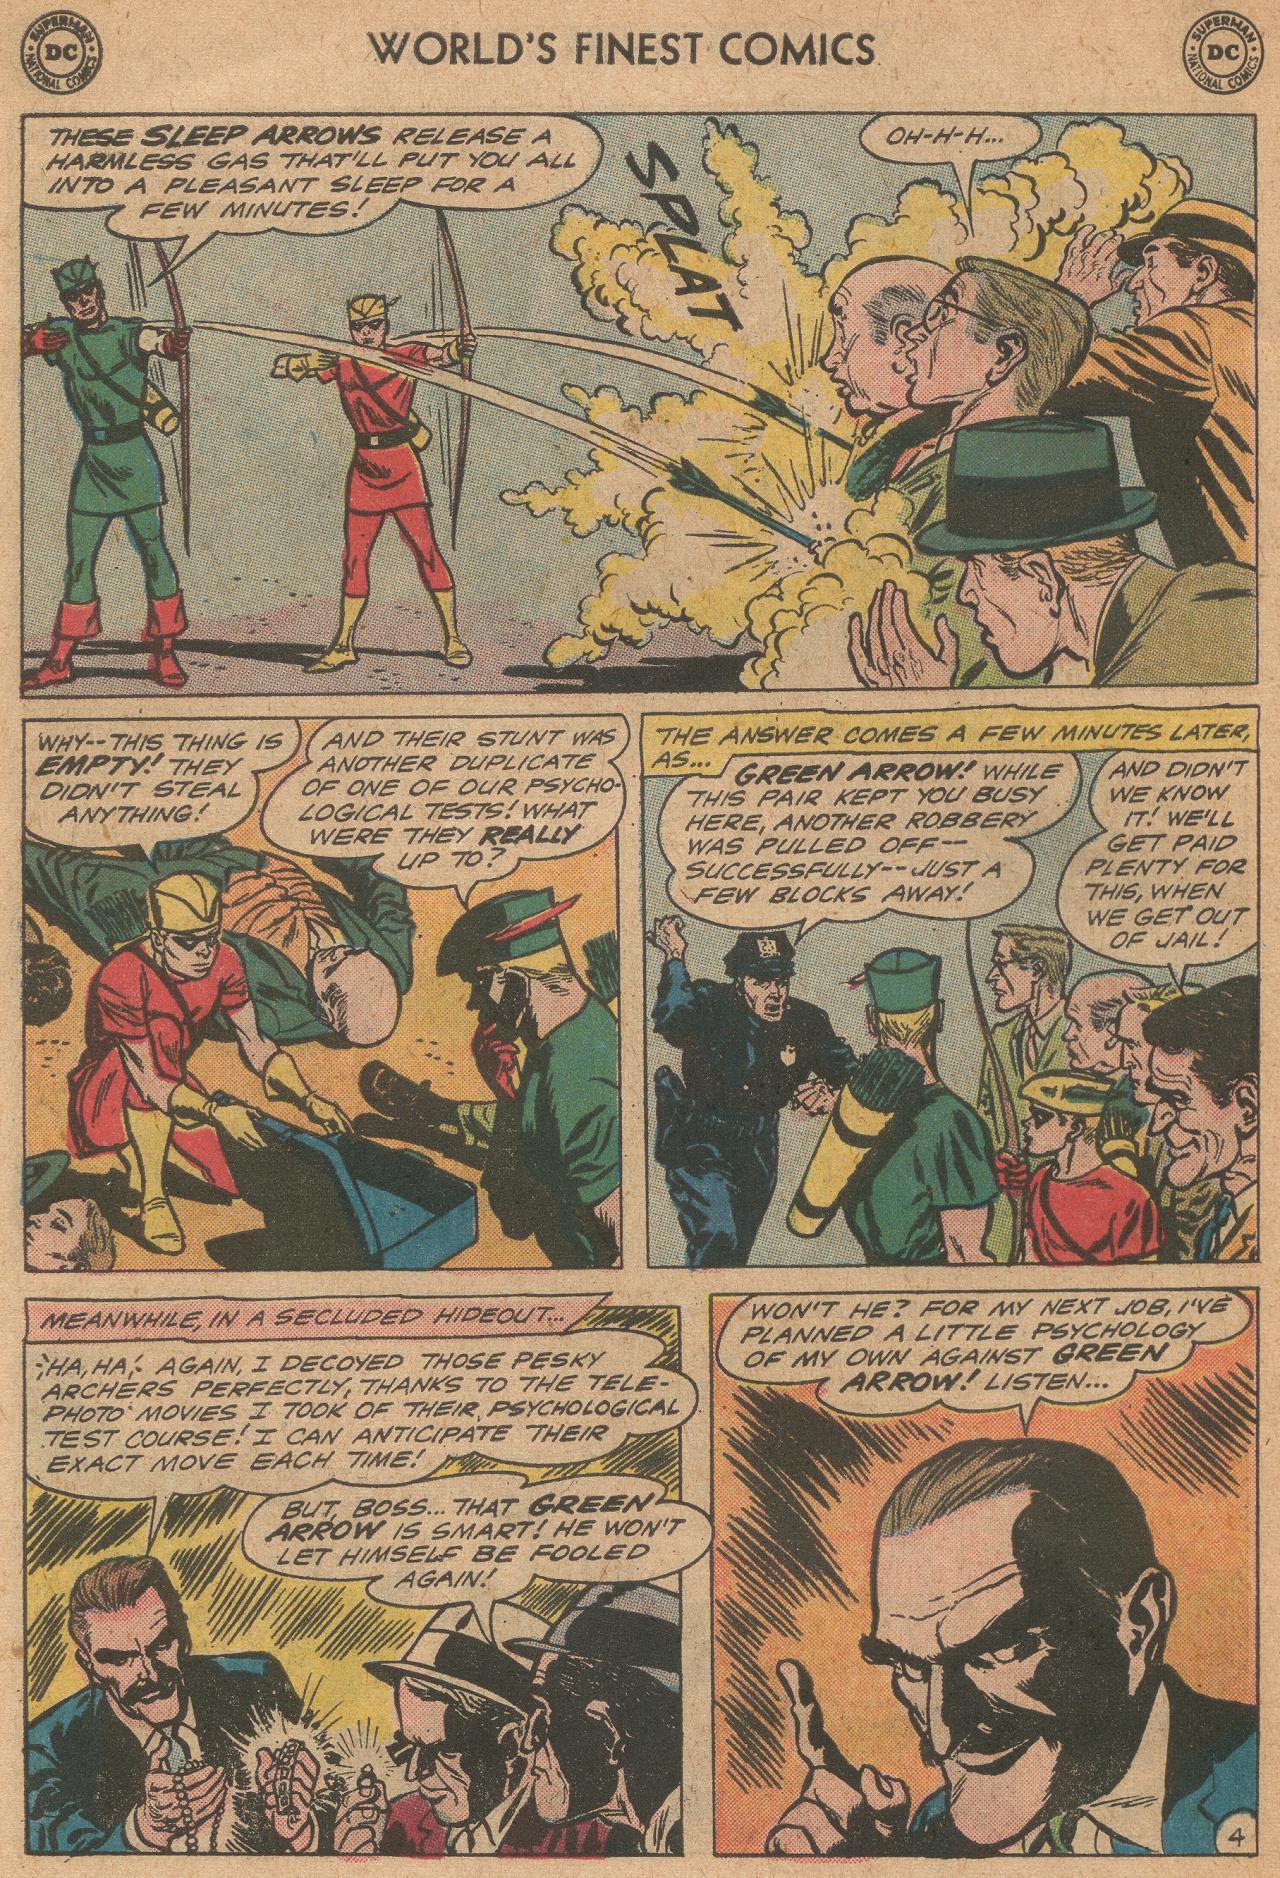 Read online World's Finest Comics comic -  Issue #126 - 27